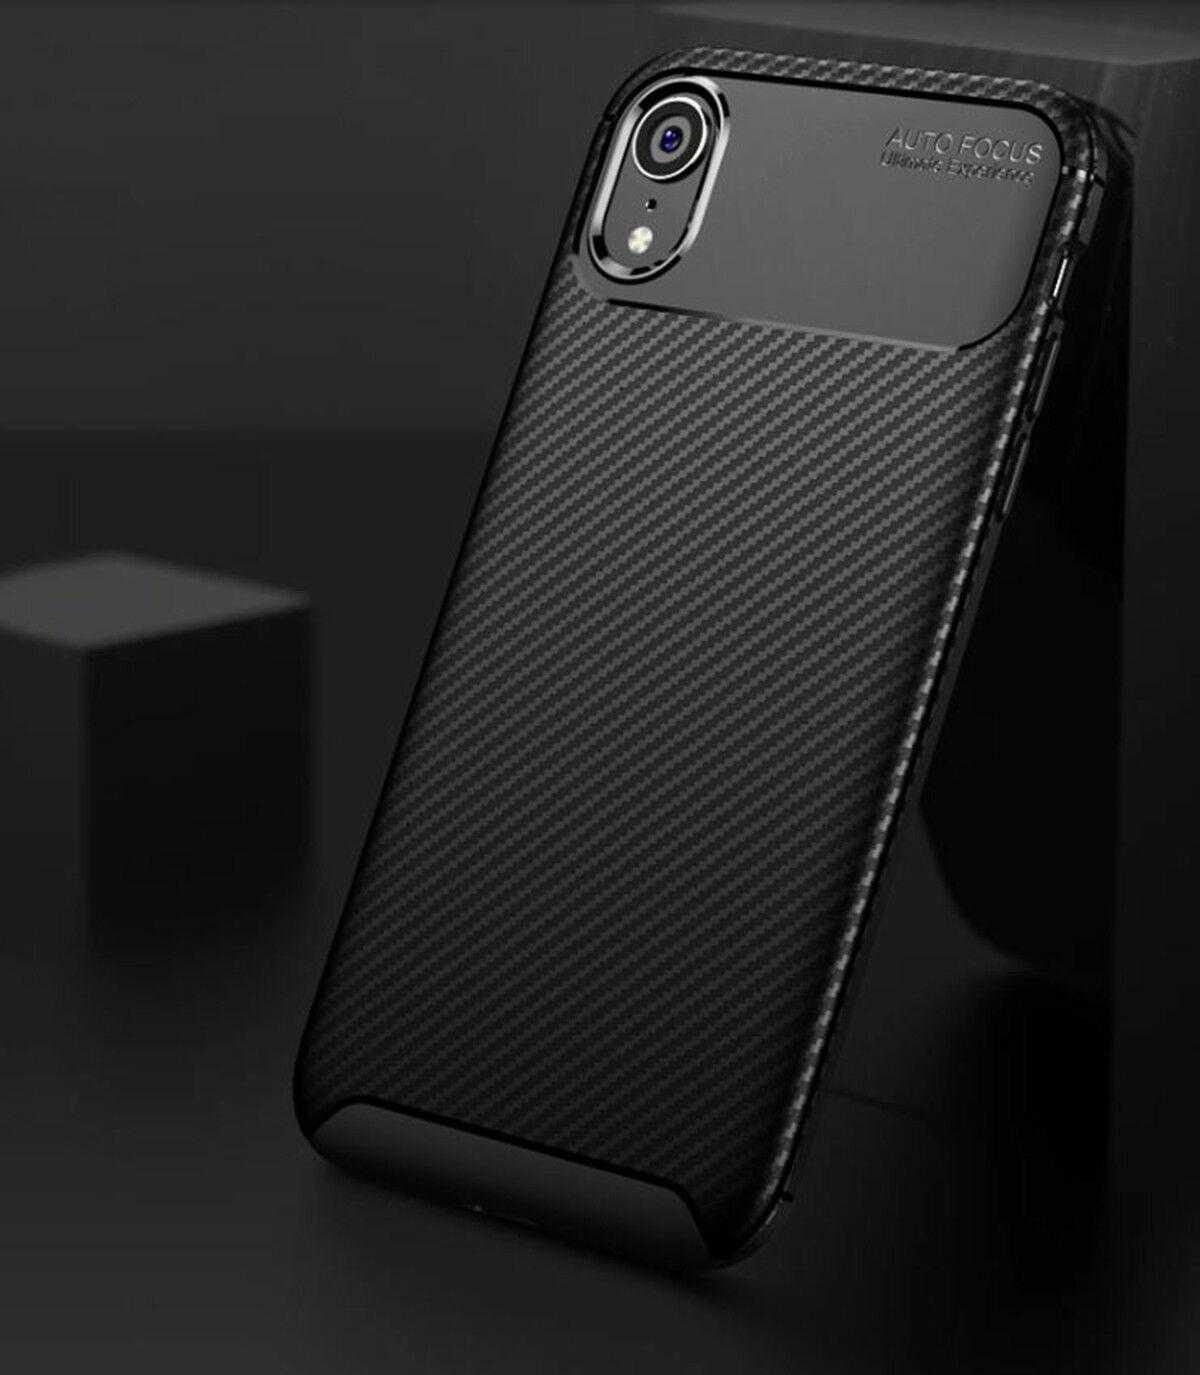 CoverTpu Cover iPhone 6s Plus Silicone